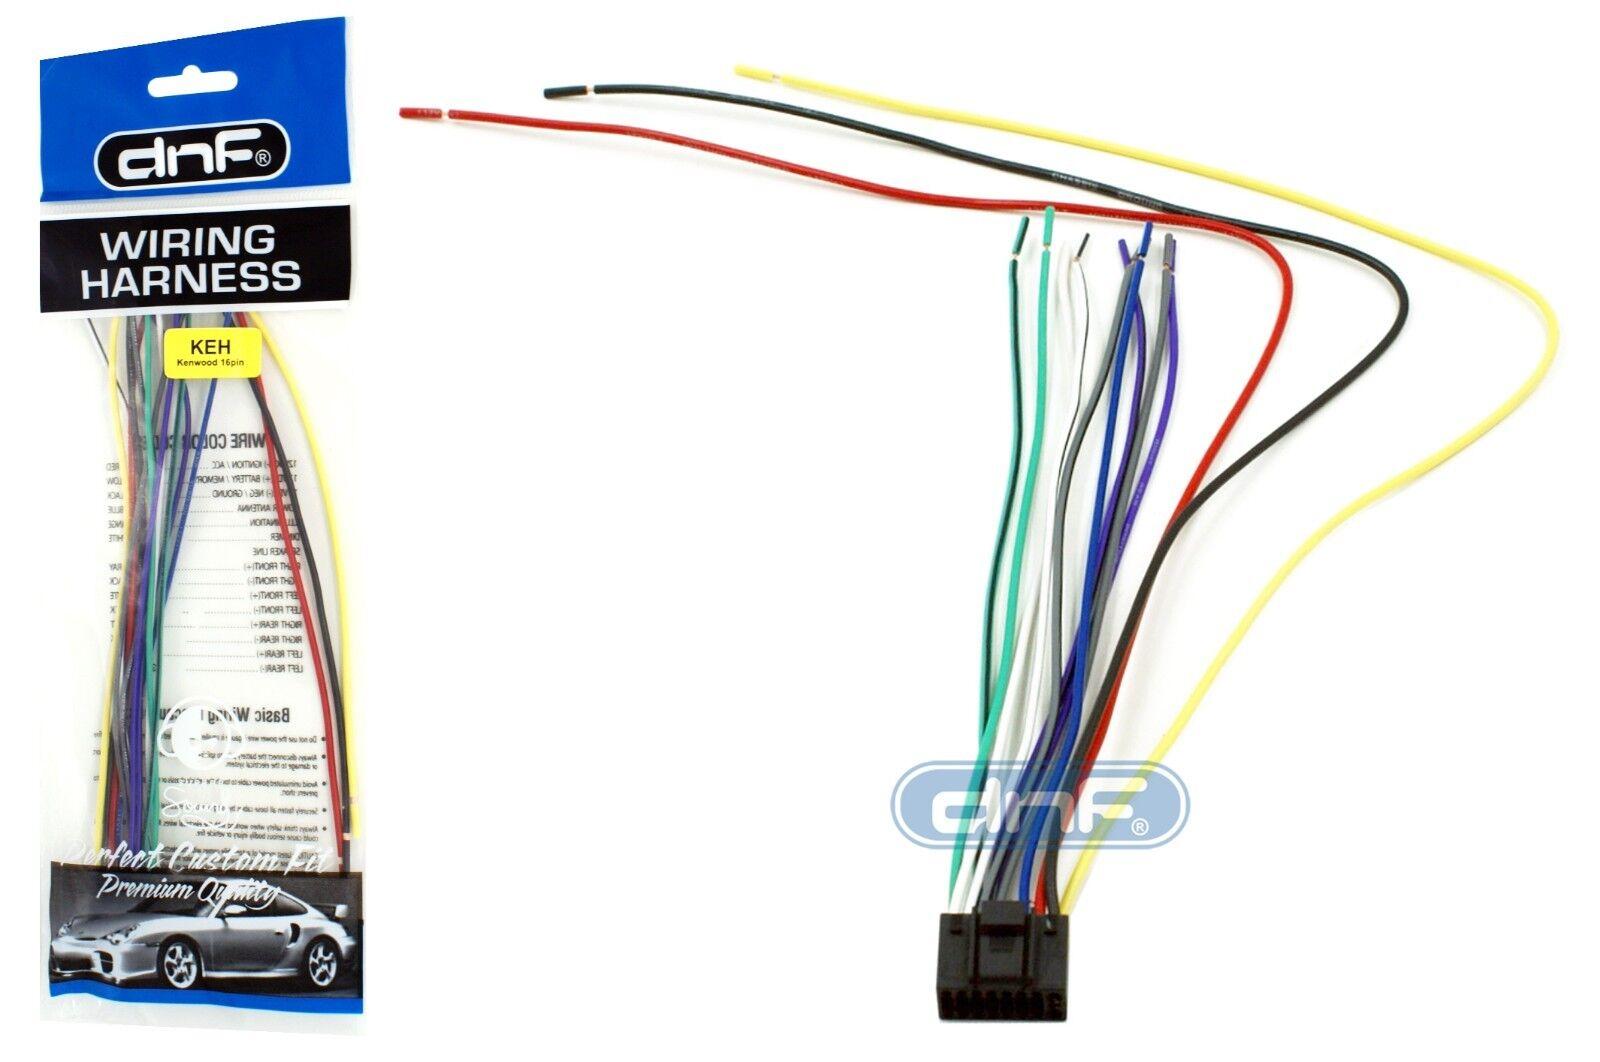 hight resolution of kenwood kdc 215s car stereo wiring diagram basic electronics kenwood wiring harness diagram colors kenwood kdc 215s car stereo wiring diagram